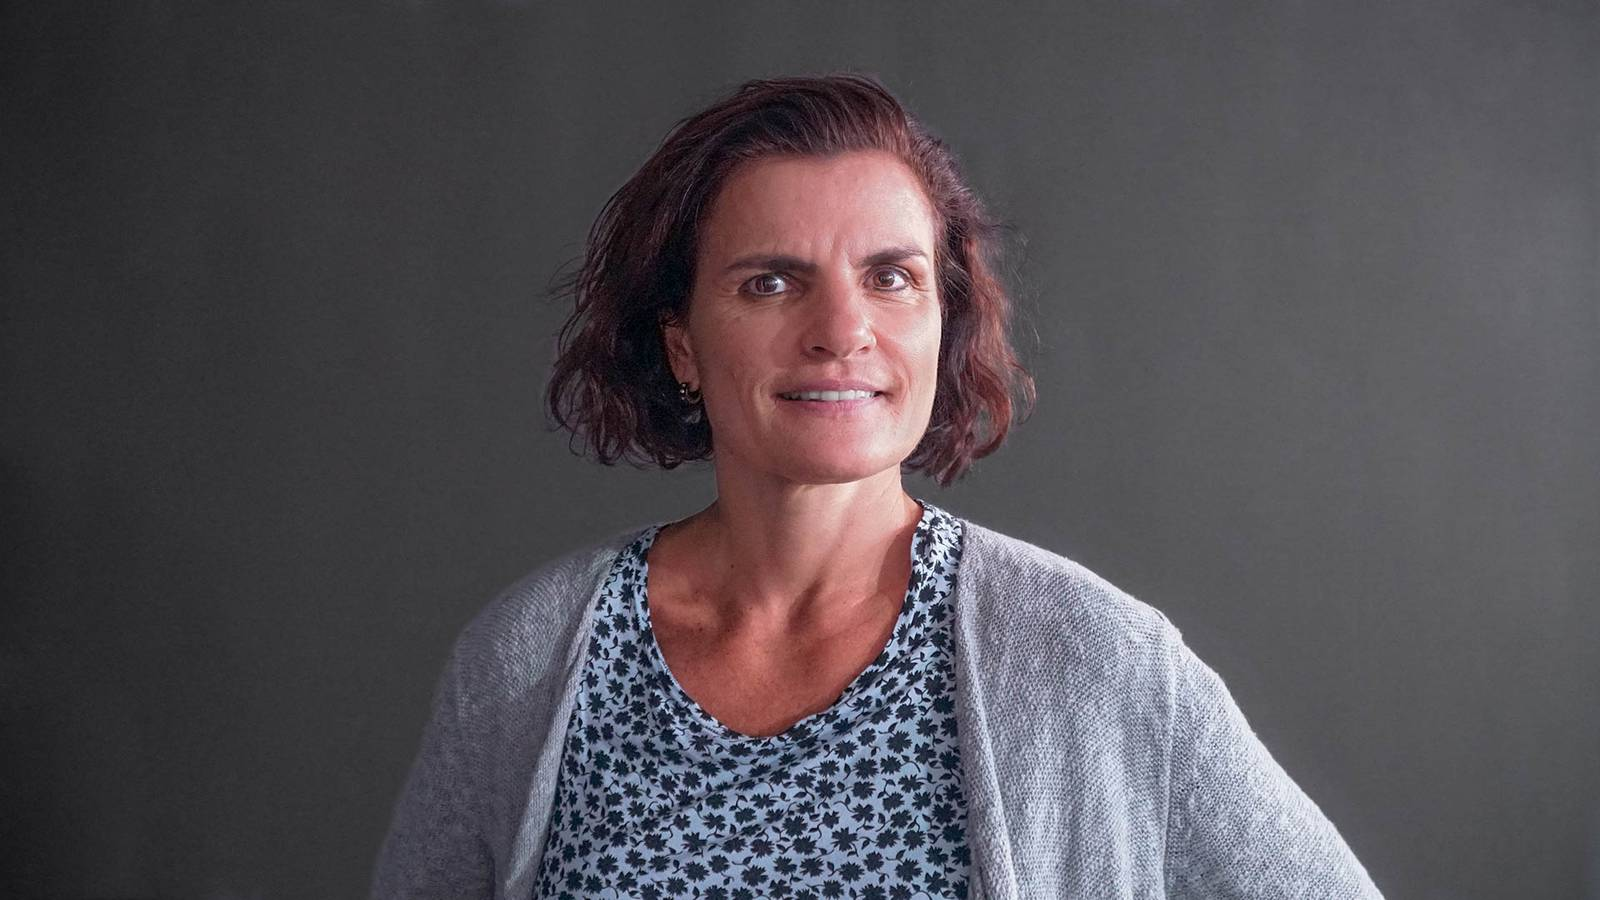 Doris Labruzzo, Spitex-Mitarbeiterin (© Radio 24)